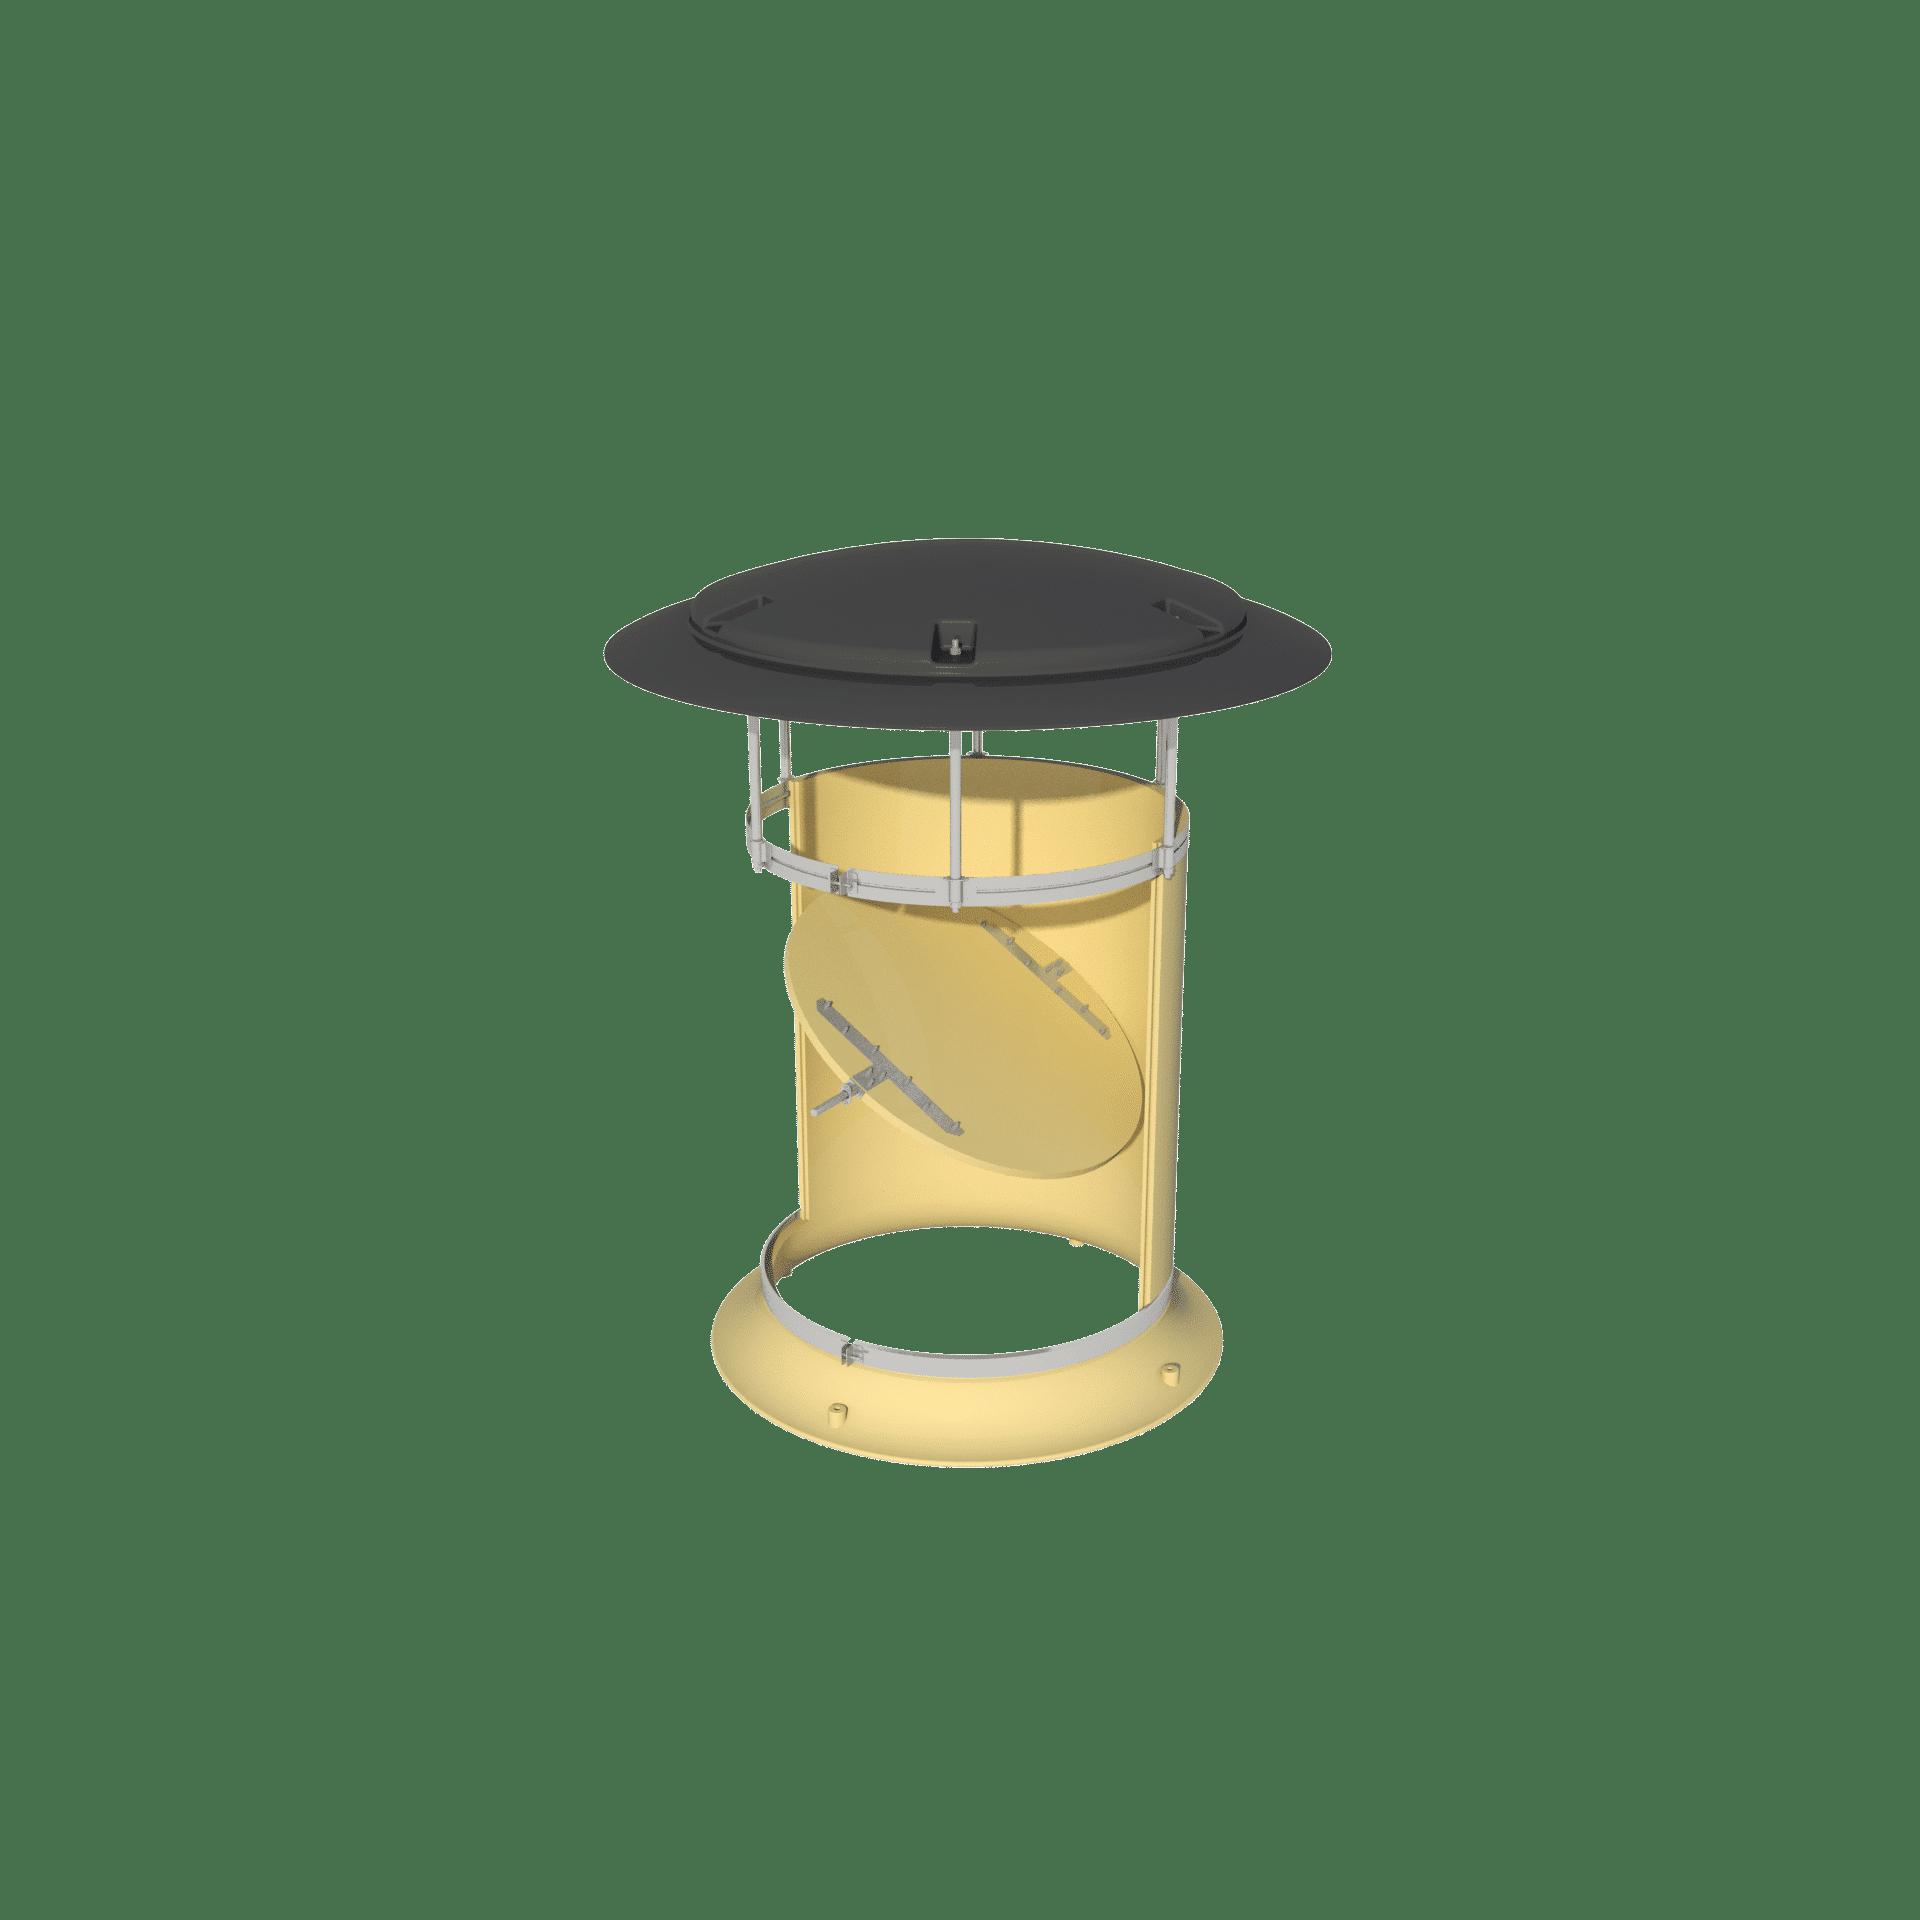 Rain Cap Valve Exhaust